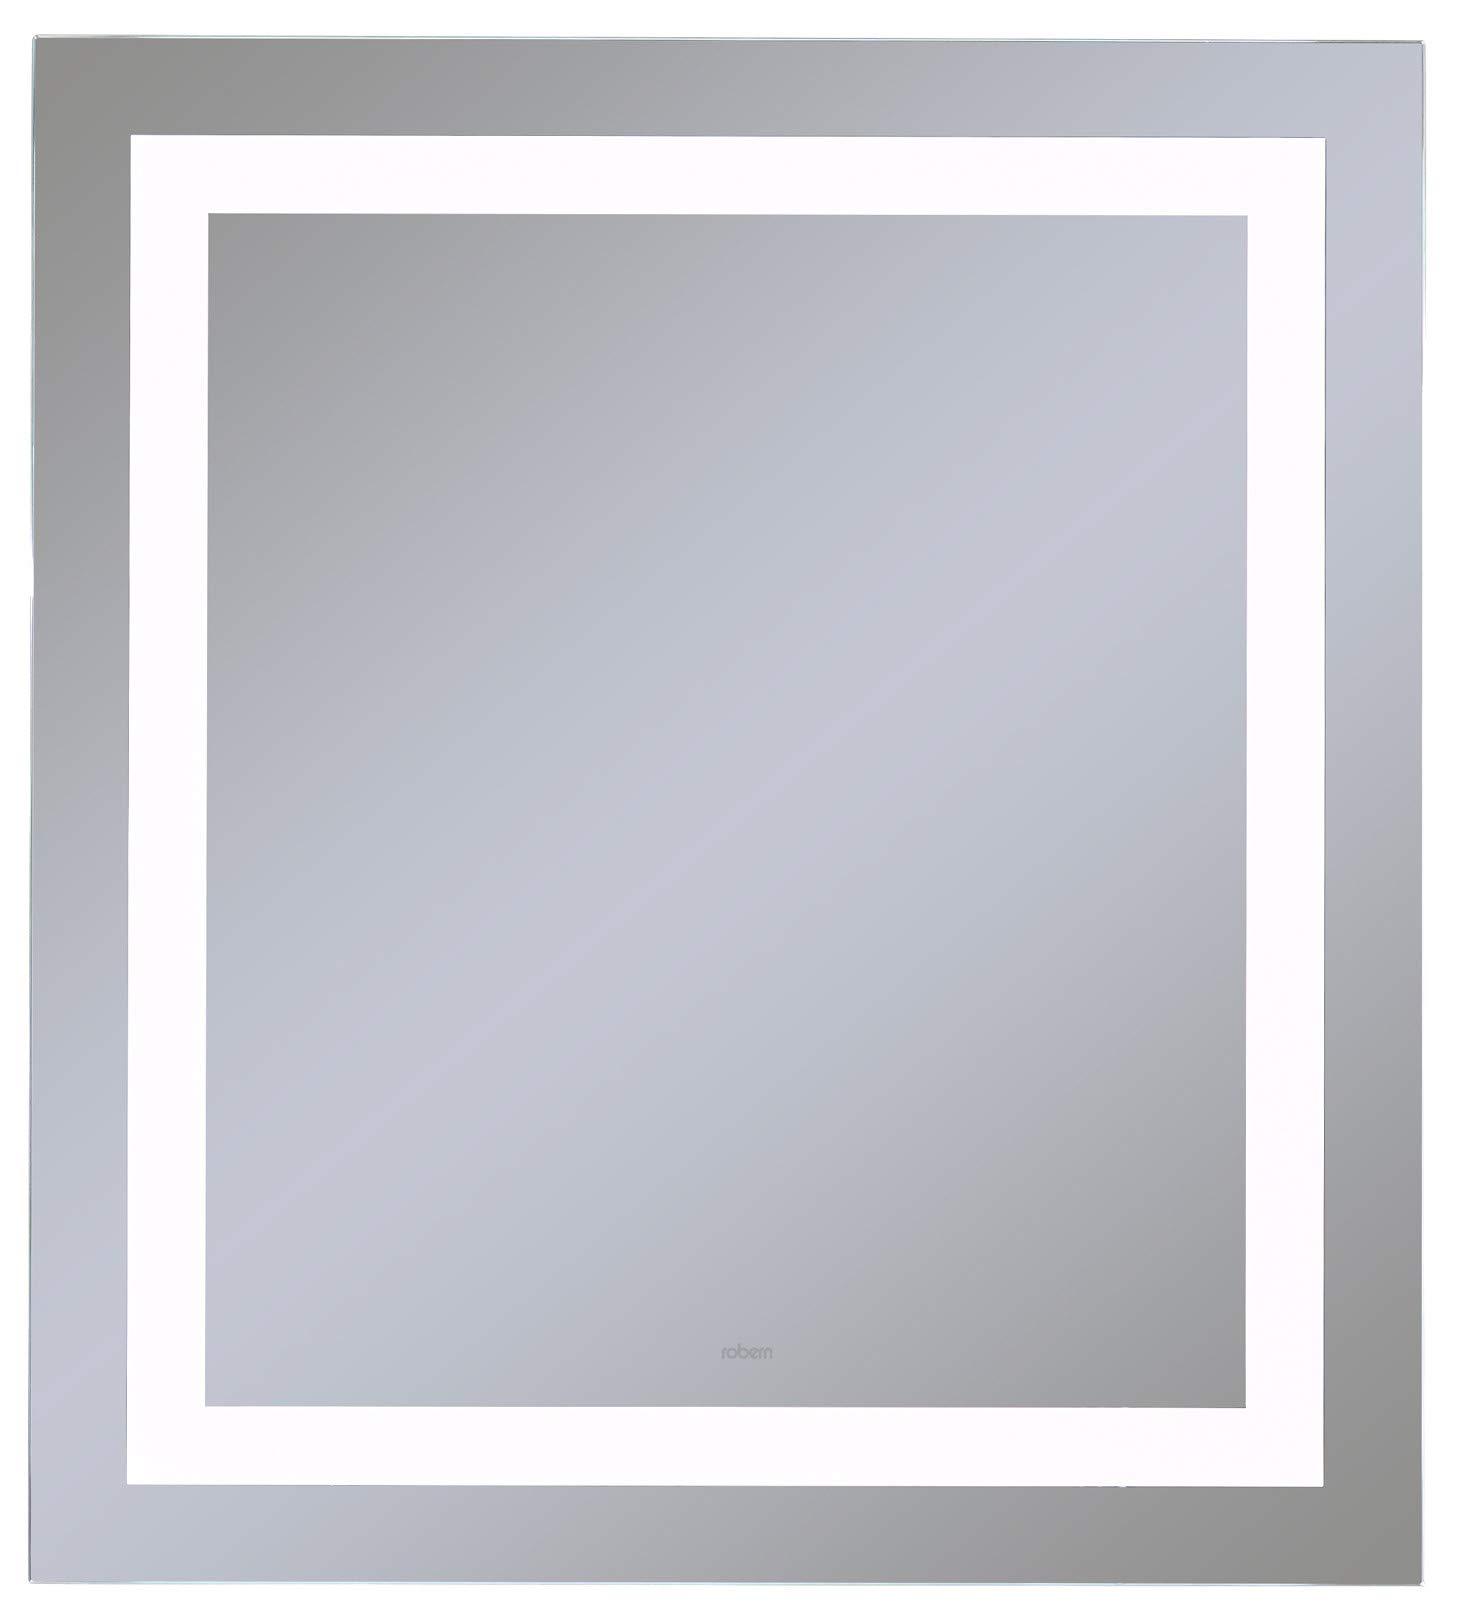 Robern YM2430RIFPD4 Vitality Lighted Mirror by Robern